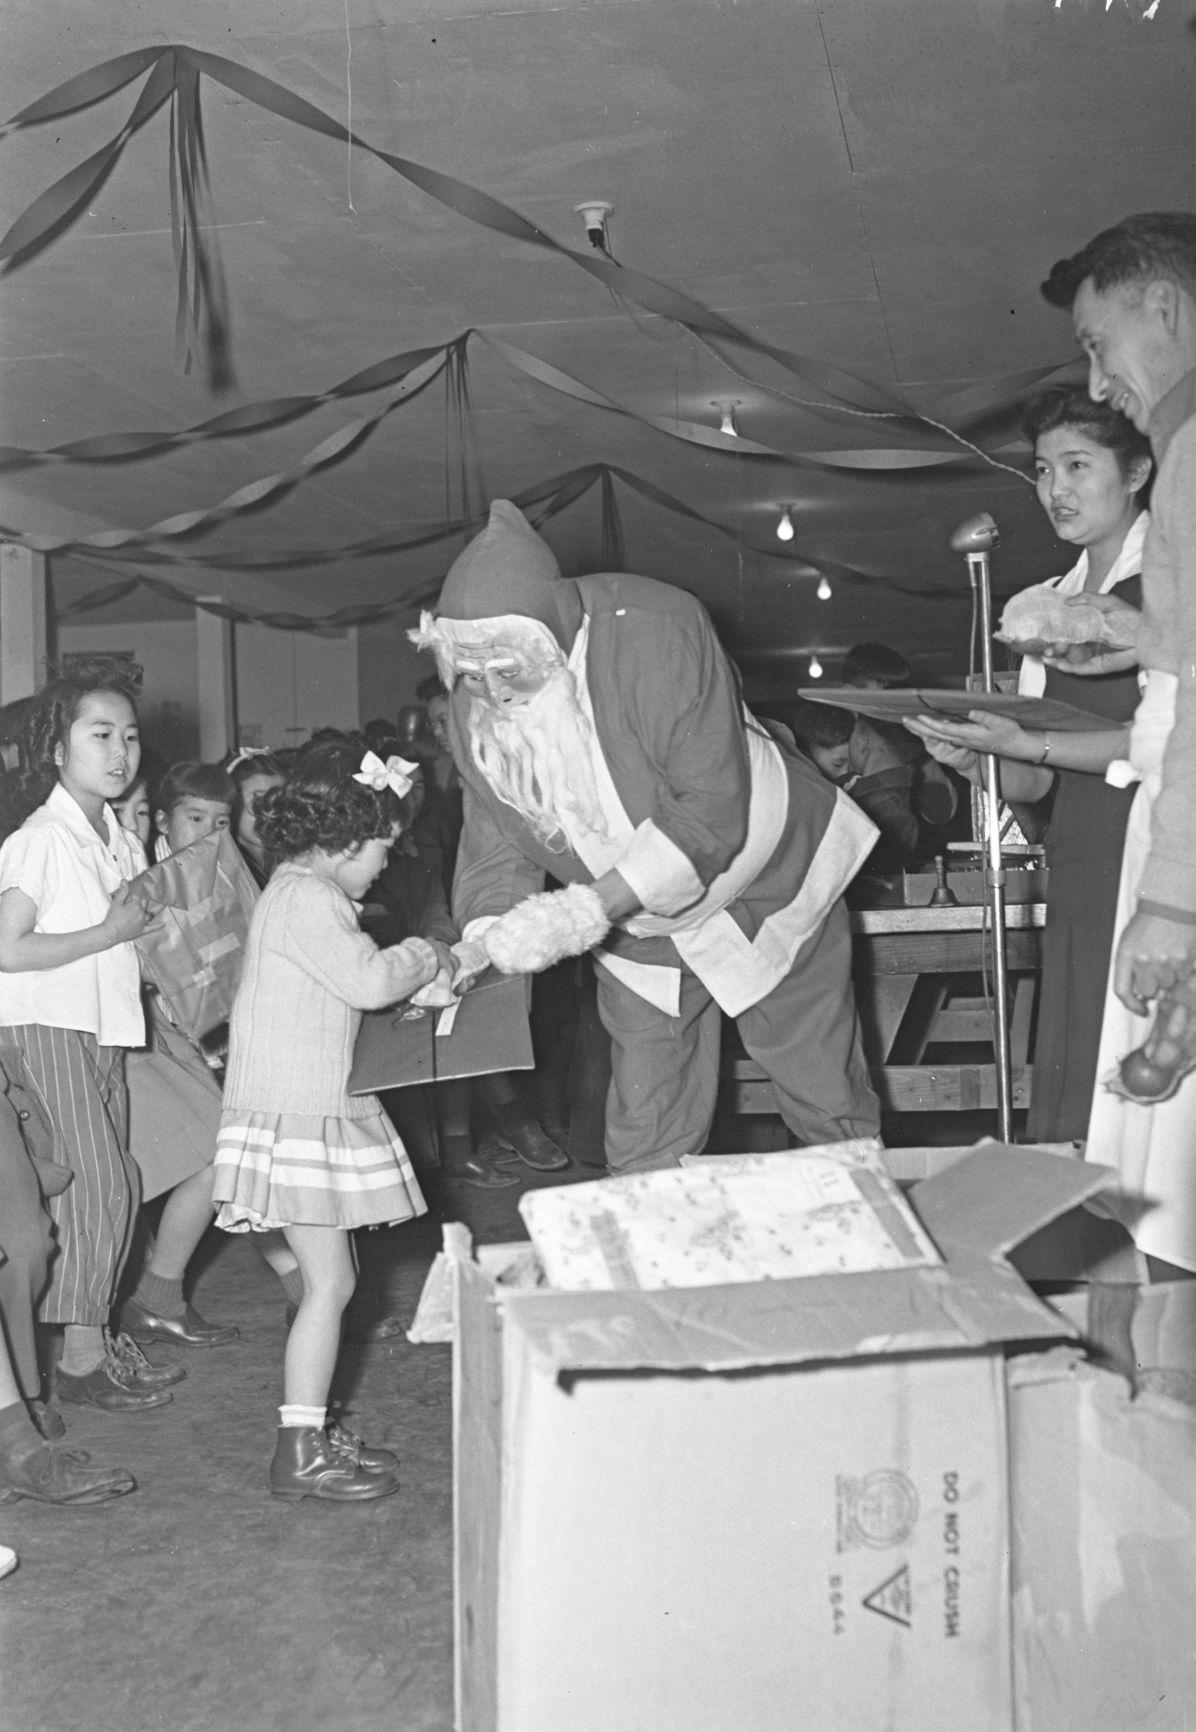 japanesechristmas-YH-121917-2.jpg